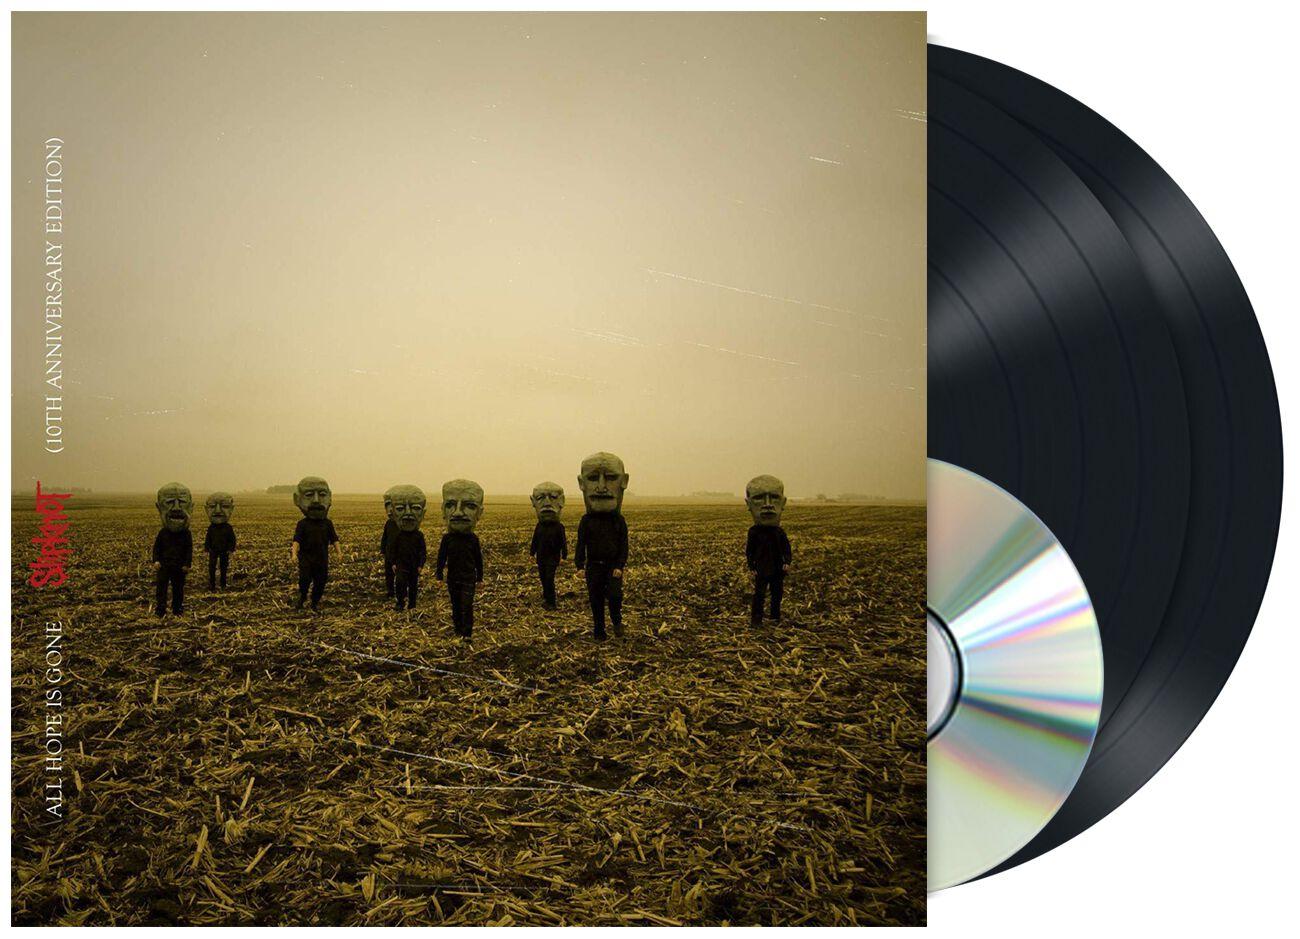 Image of   Slipknot All hope is gone 2-LP & CD standard